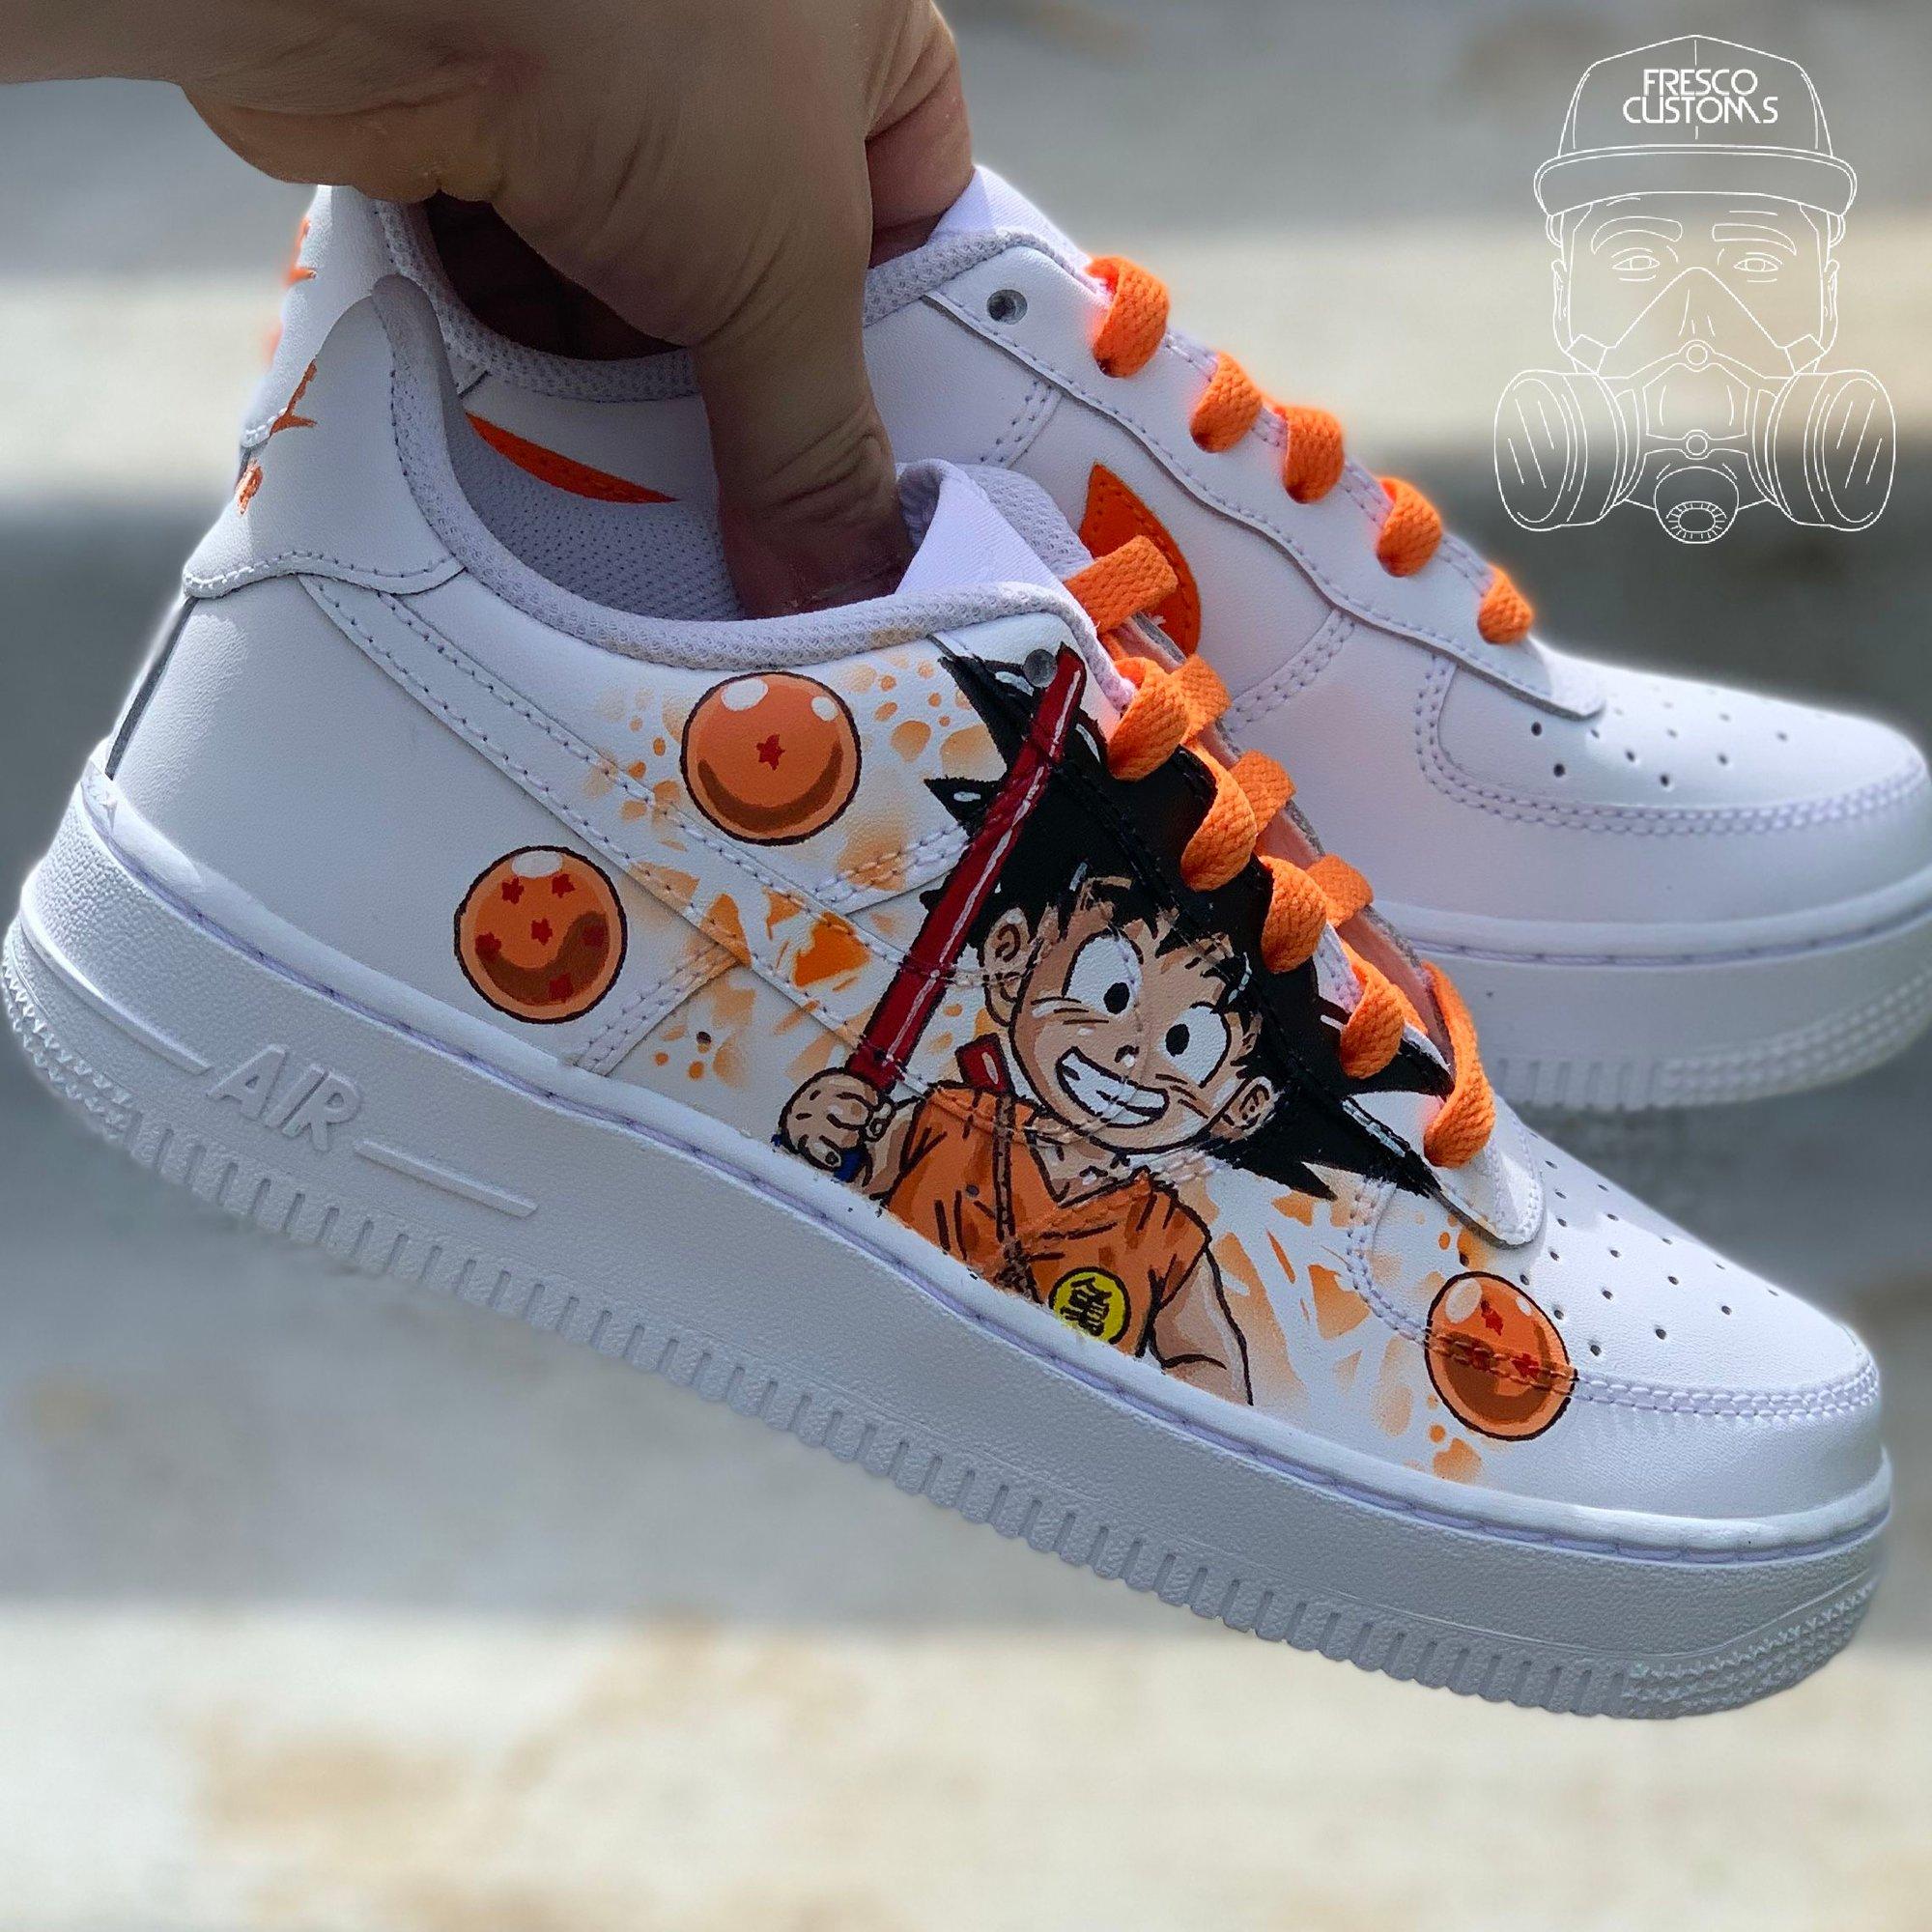 Perder la paciencia Colapso Mar  Custom Baby Goku Nike Air Forces | Fresco Customs